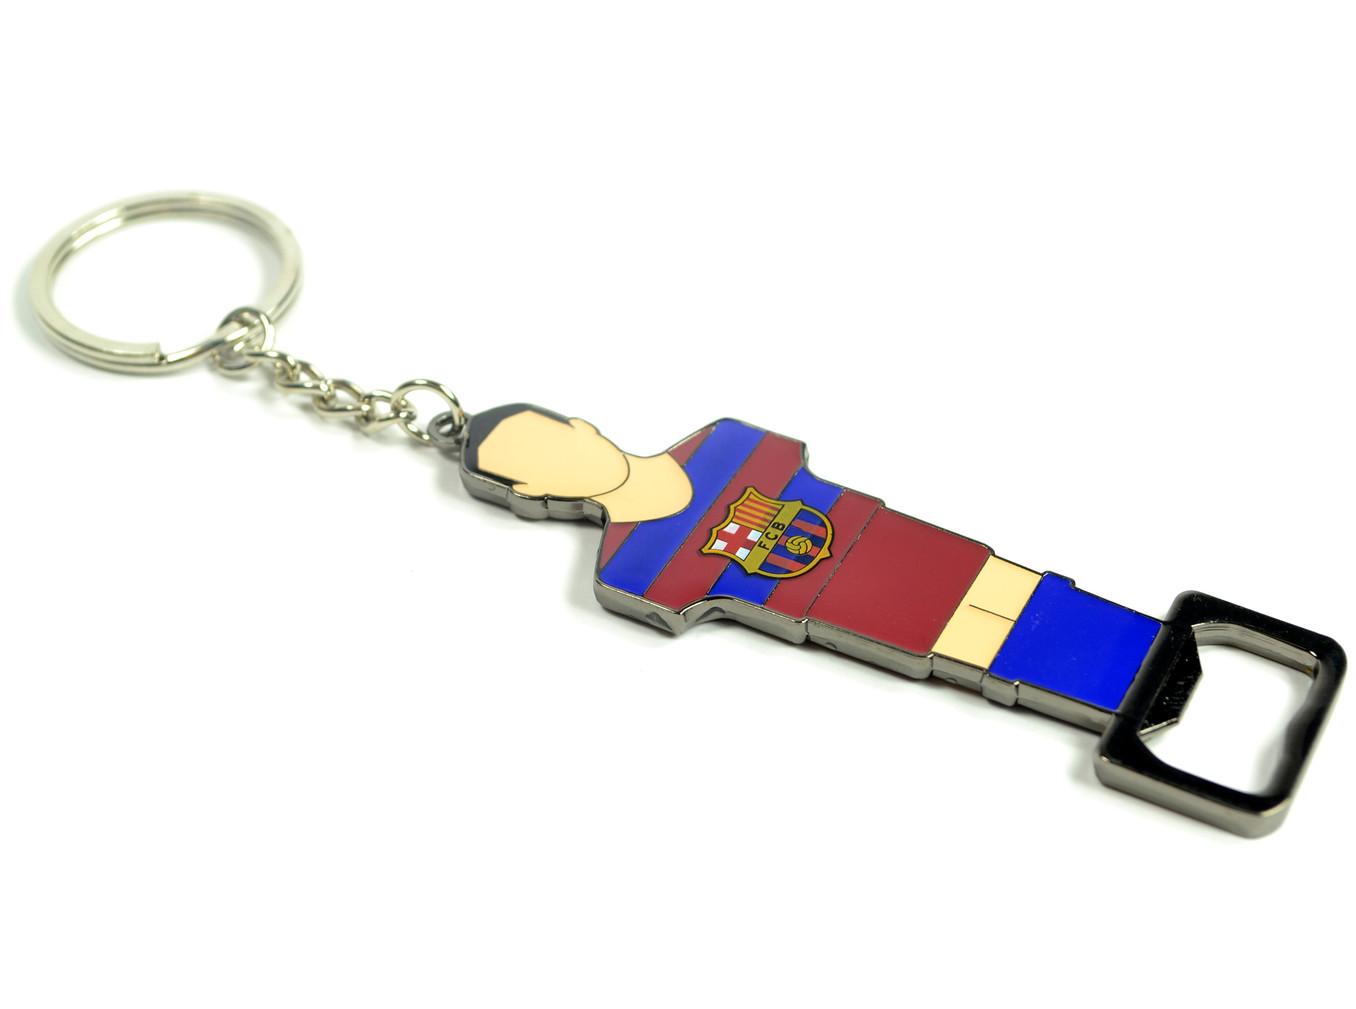 Barca foosball key ring